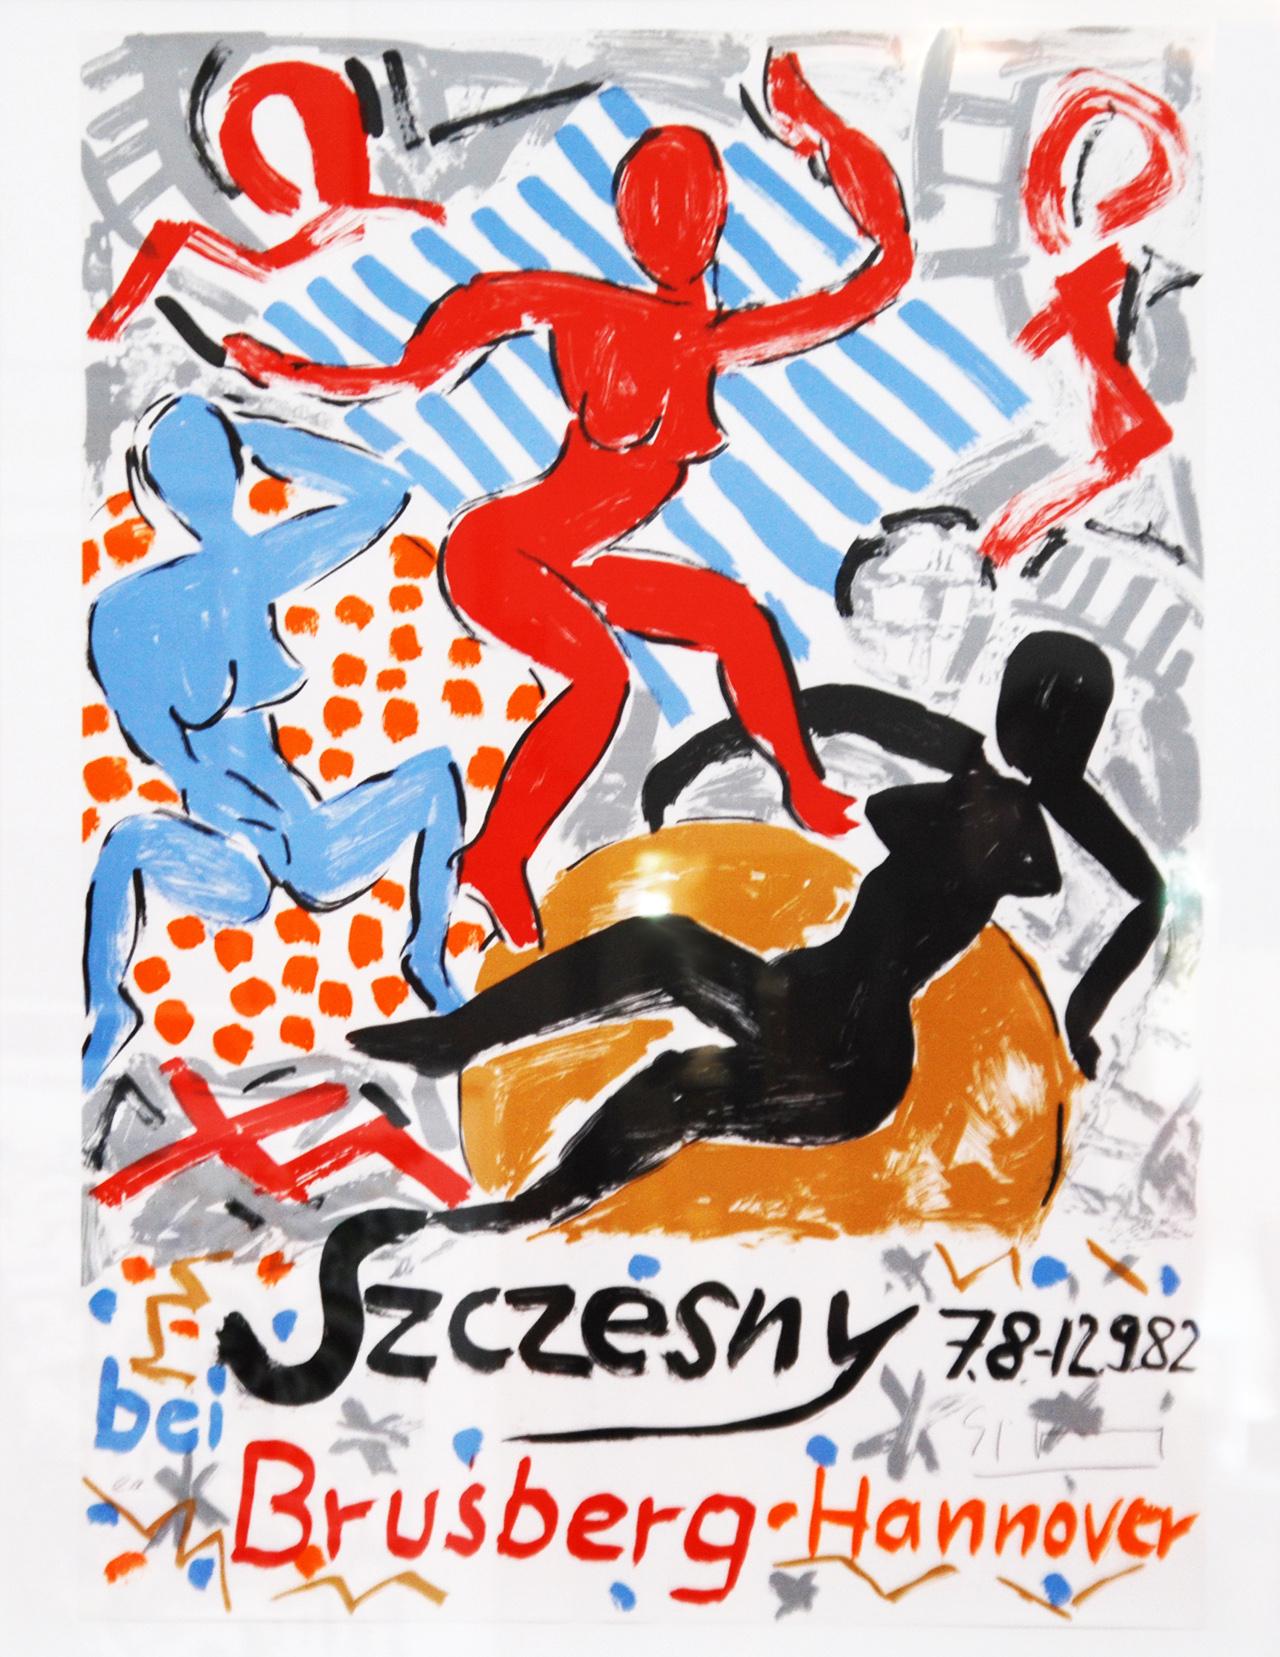 Ausstellungsplakat Szczesny